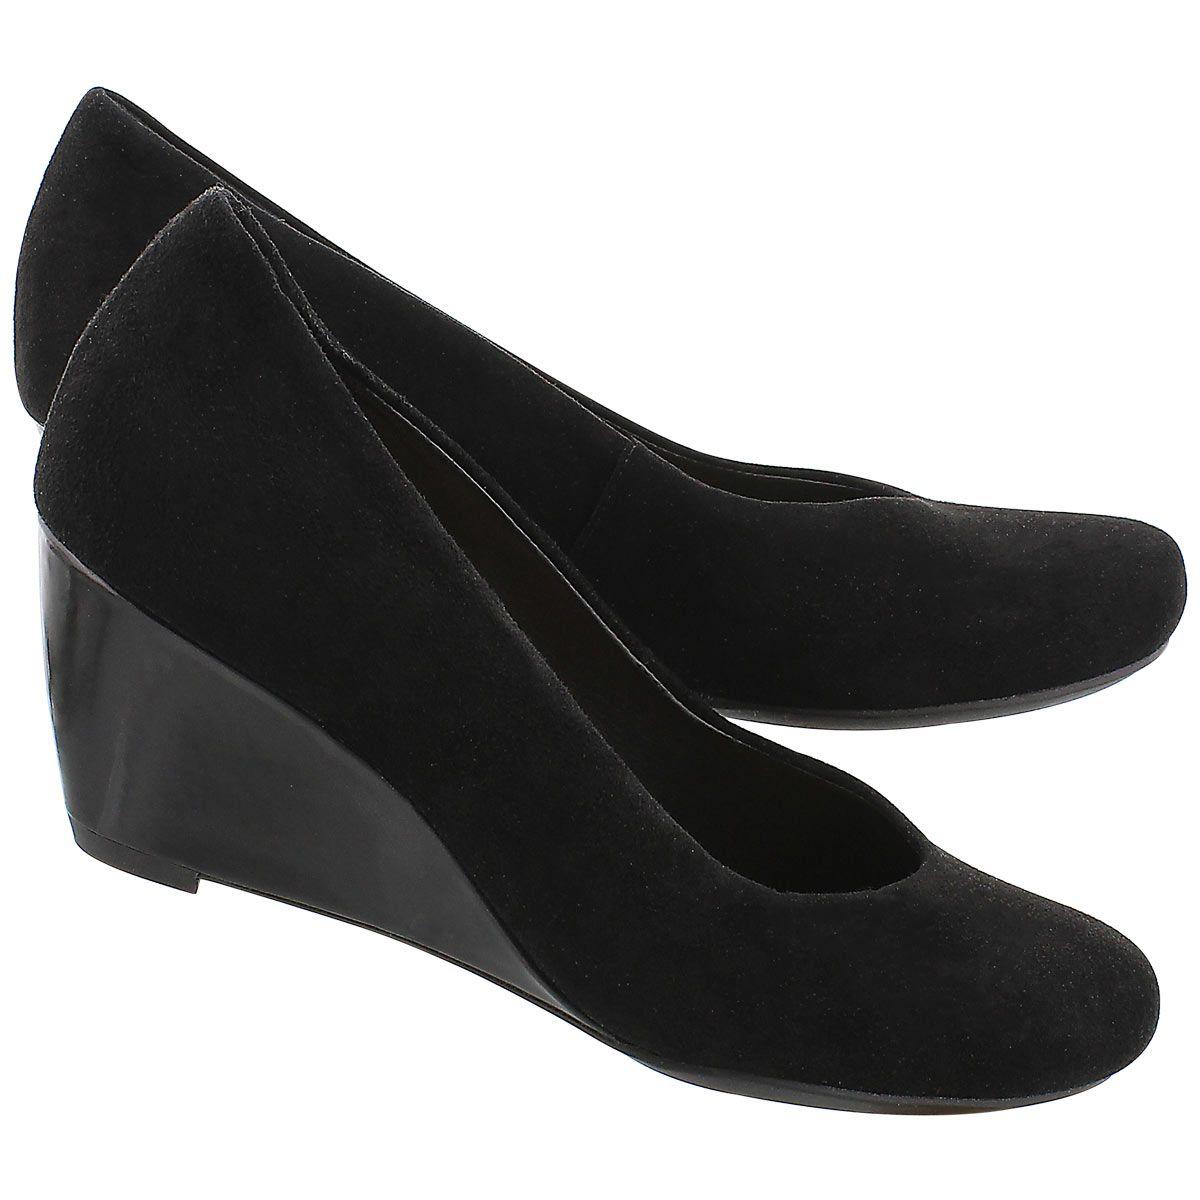 fbcdda37 Clarks Women's BASSETT MINE black suede dress wedges 03355M   The ...